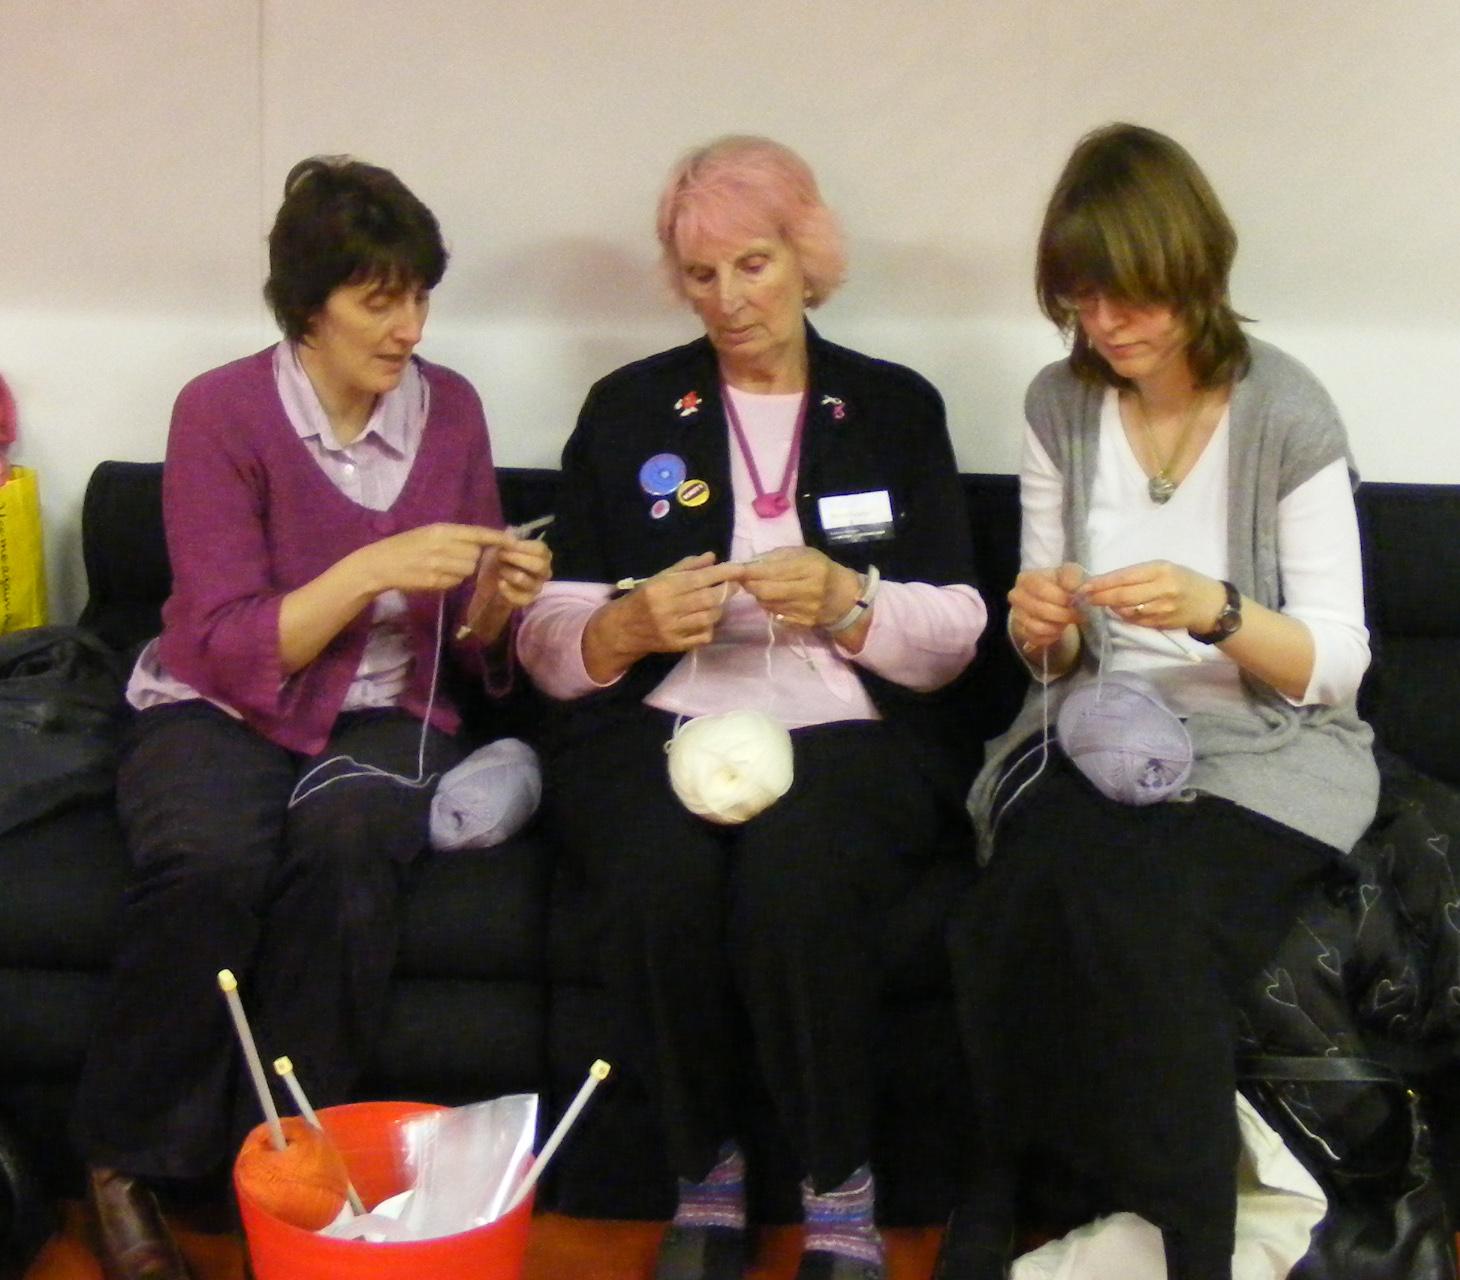 machinequilter: The Knitting and Stitching Show